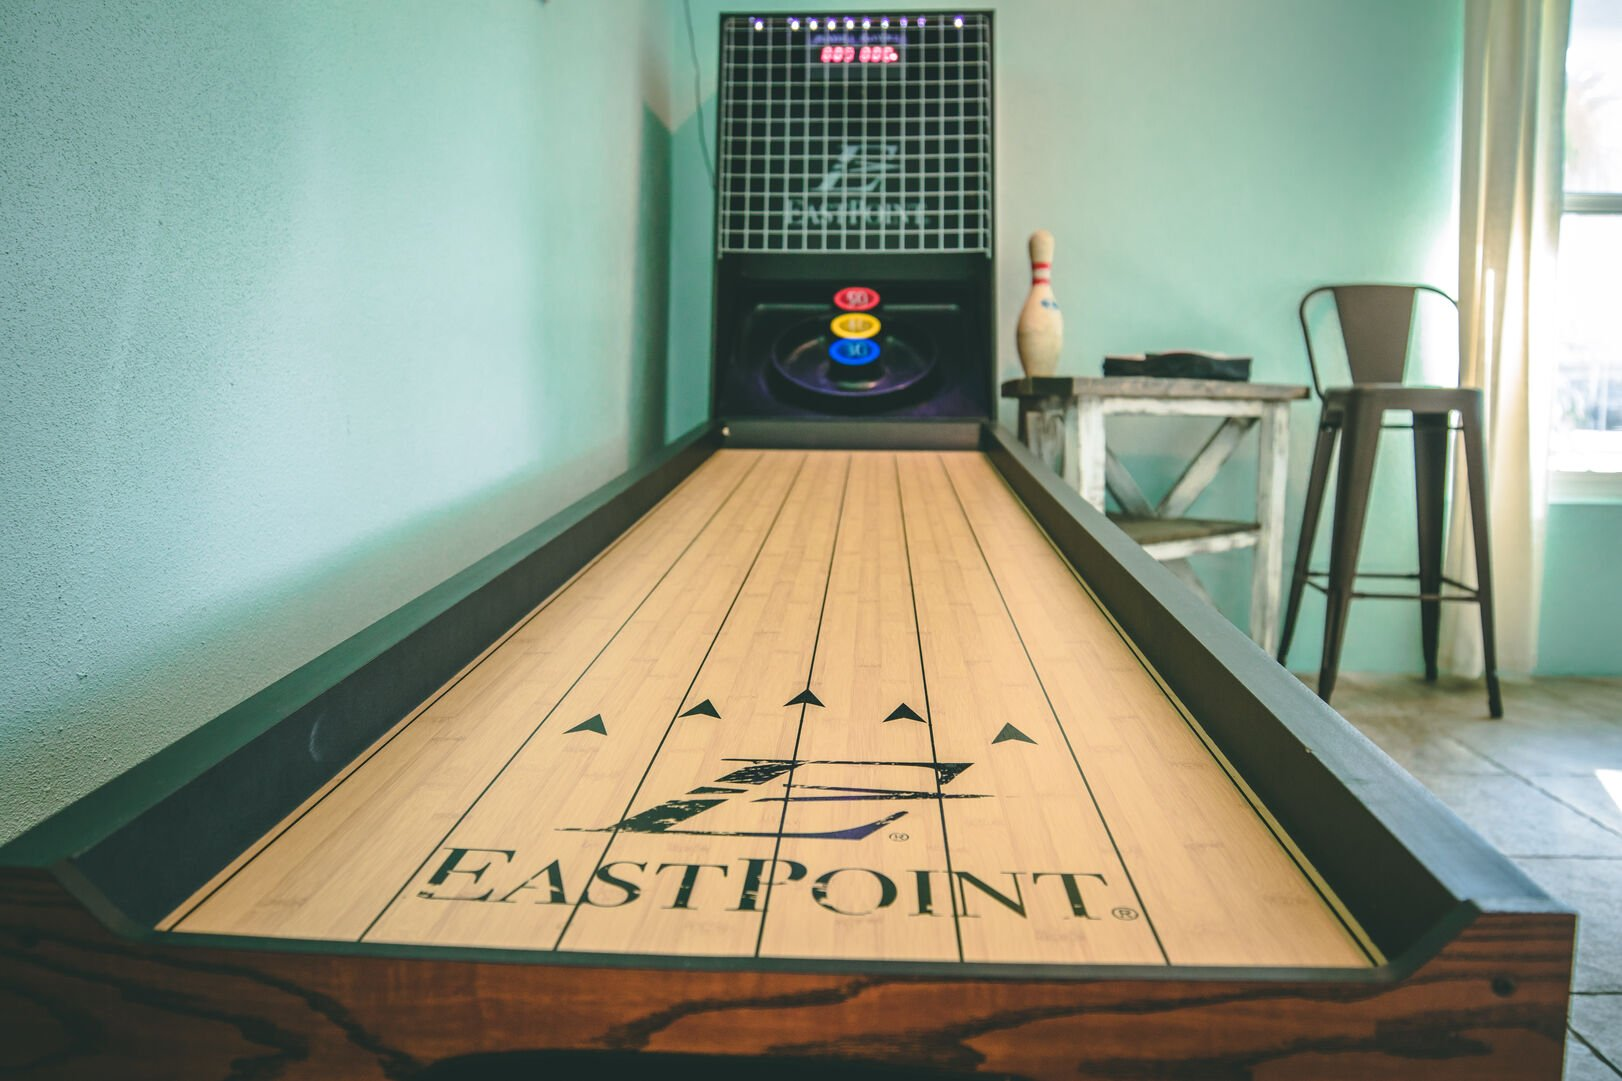 Shuffleboard table in game room